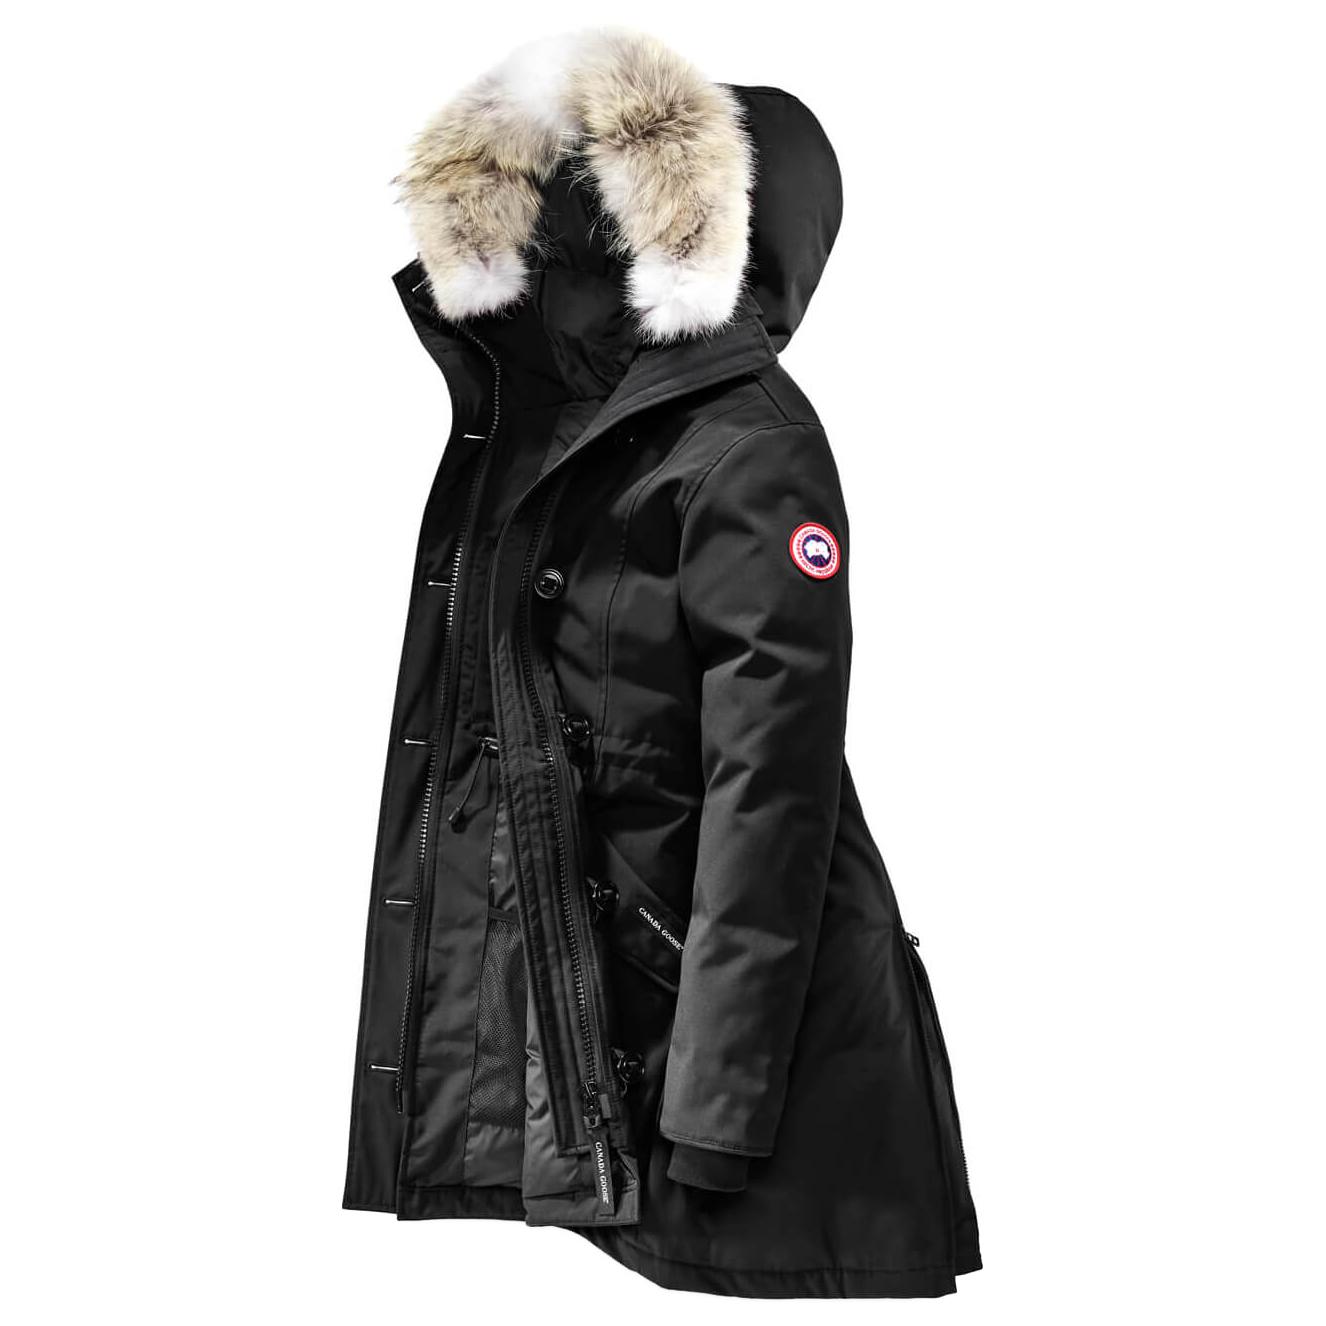 Rossclair Canada Goose Parka ElderberryXs Coat Ladies TKJ3c1Fl